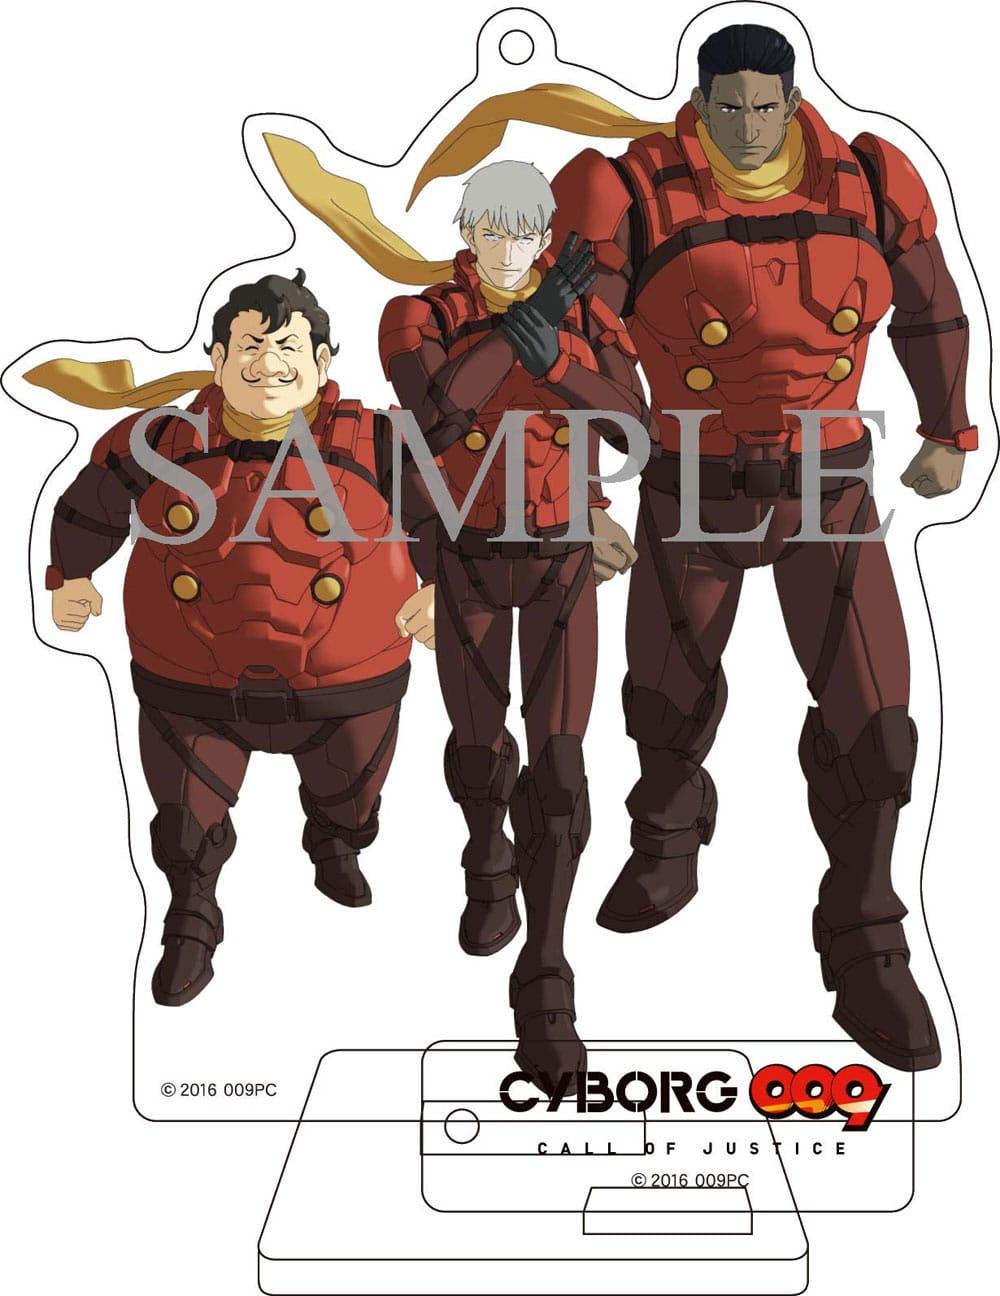 【TOHO animation STORE 限定版】CYBORG009 CALL OF JUSTICE Vol.3 DVD 初回生産限定版+オリジナルアクリルスタンディセット